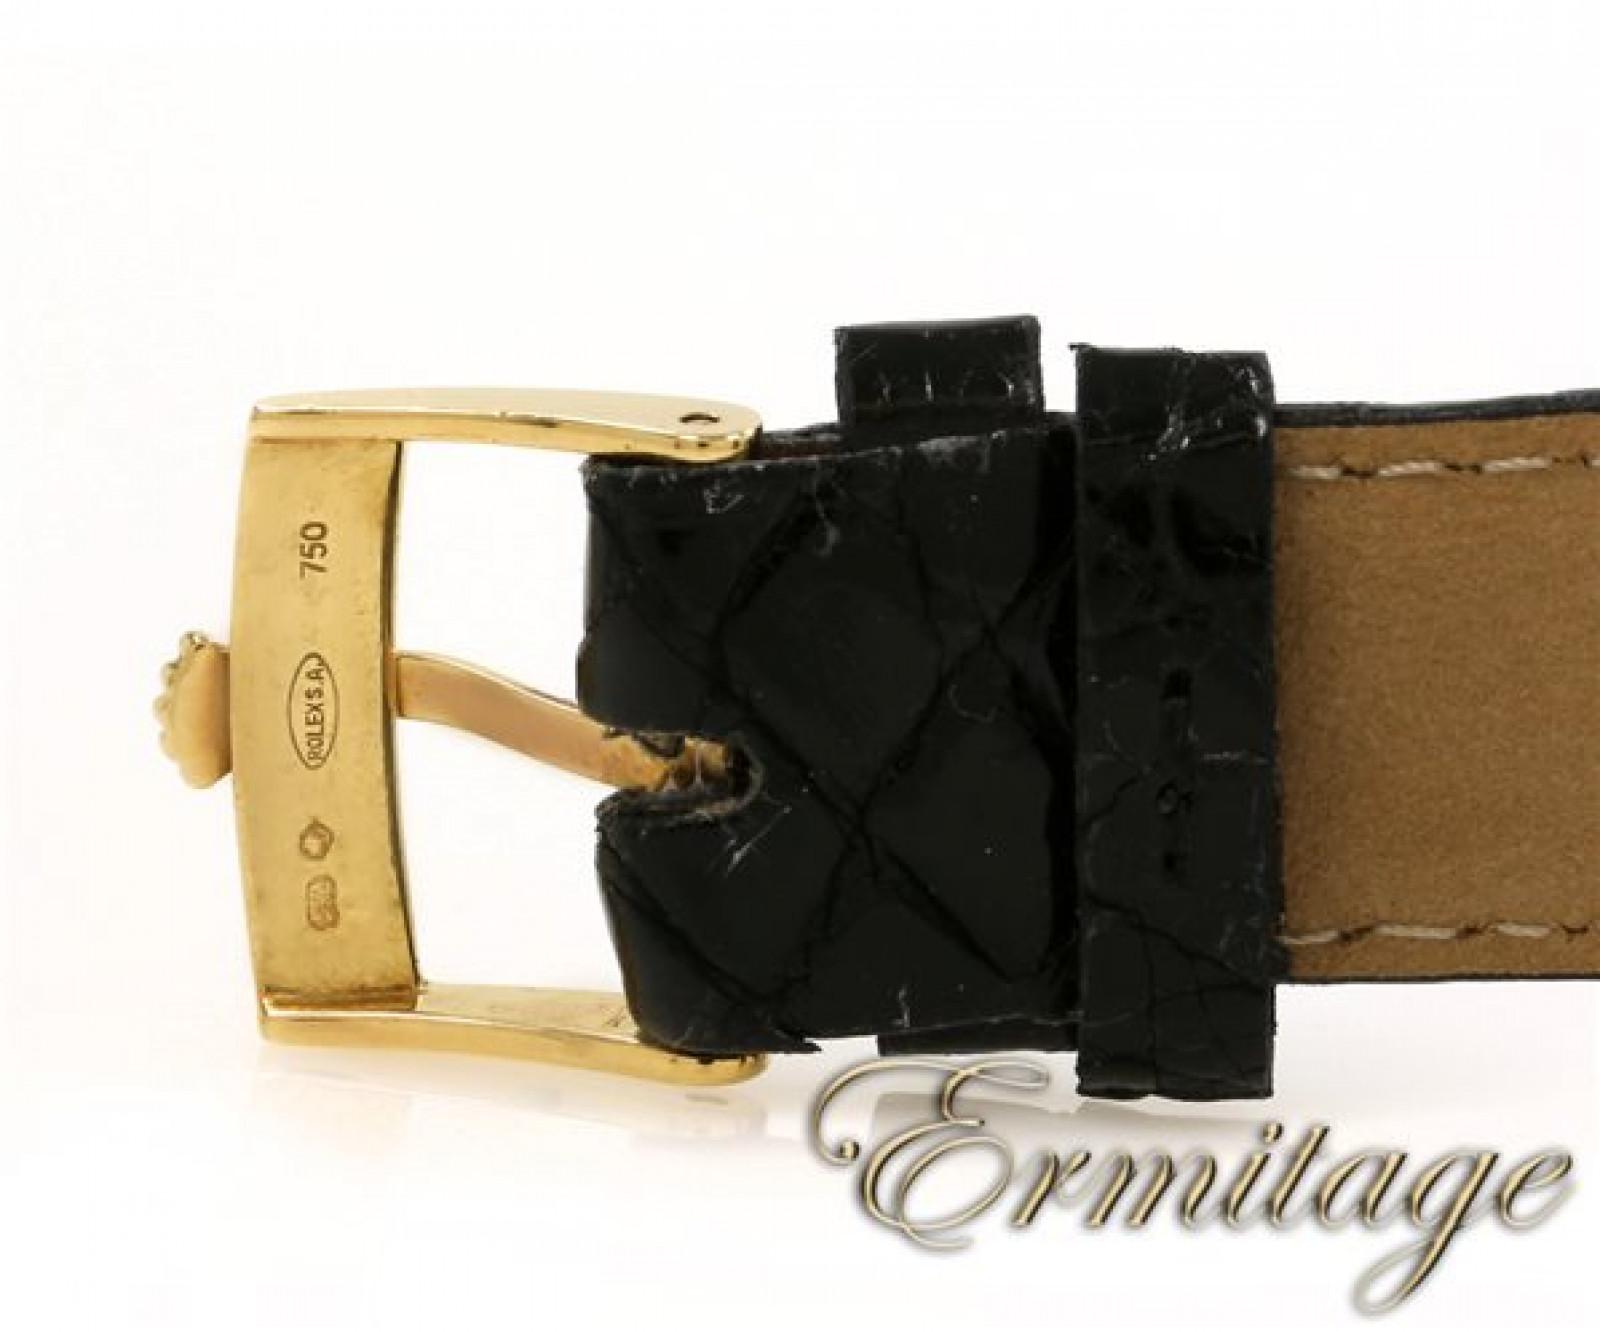 Rolex Cellini 5115 Gold Year 2000